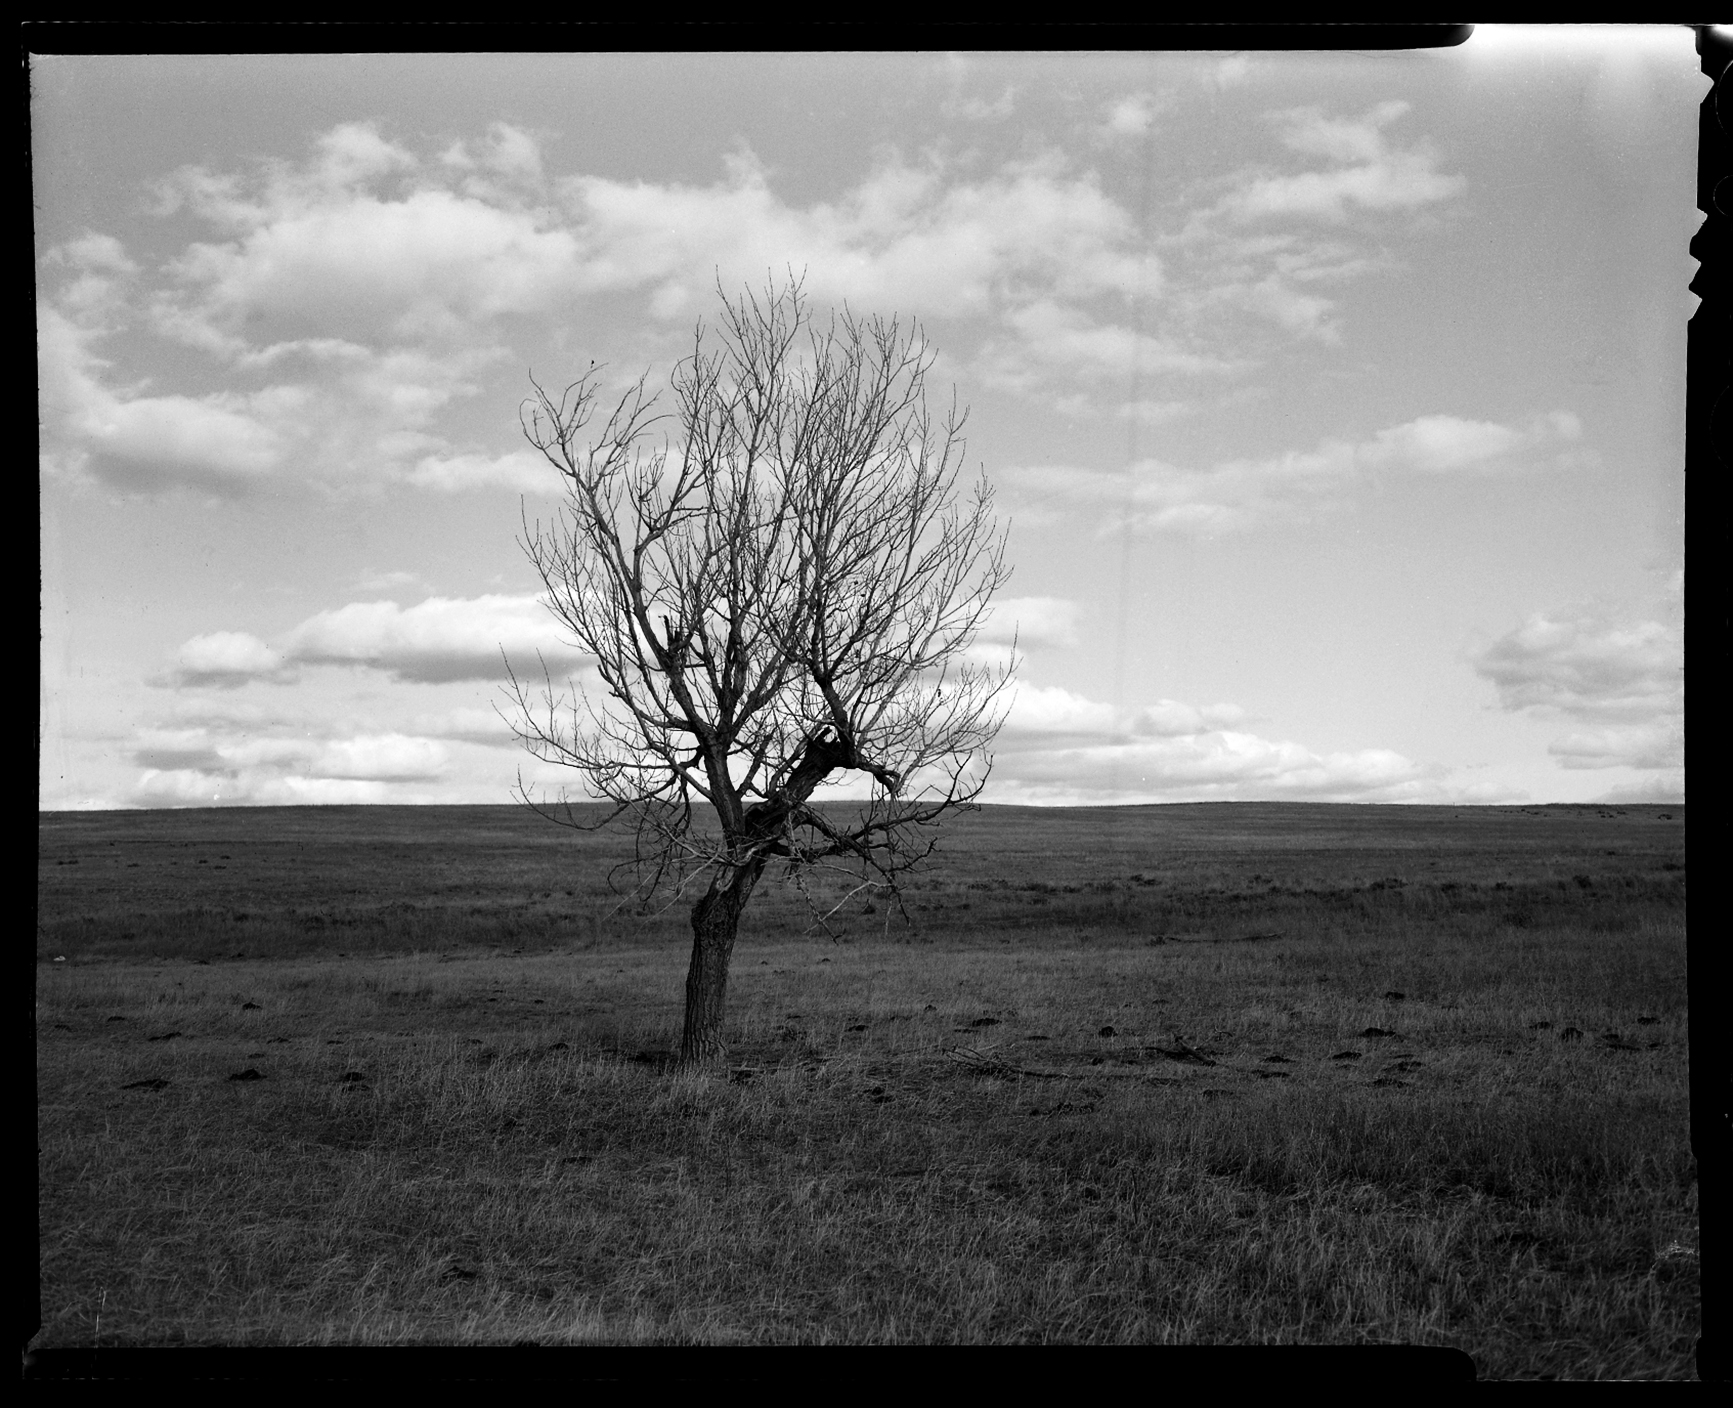 Adon Road, Gillette, Wyoming